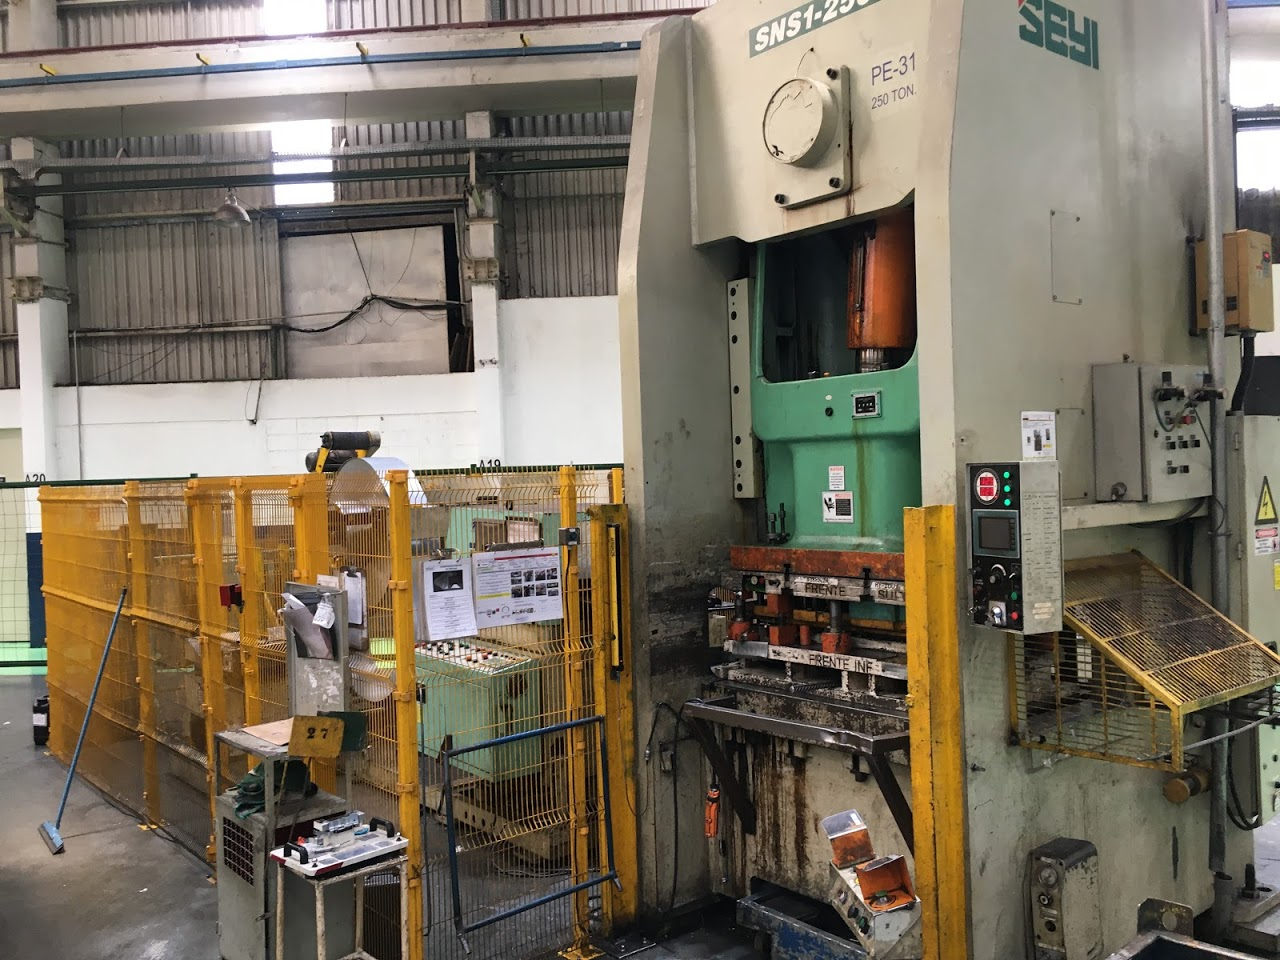 Prensa Progressiva Seyi 250 ton #8-1101  - AEG Comercial